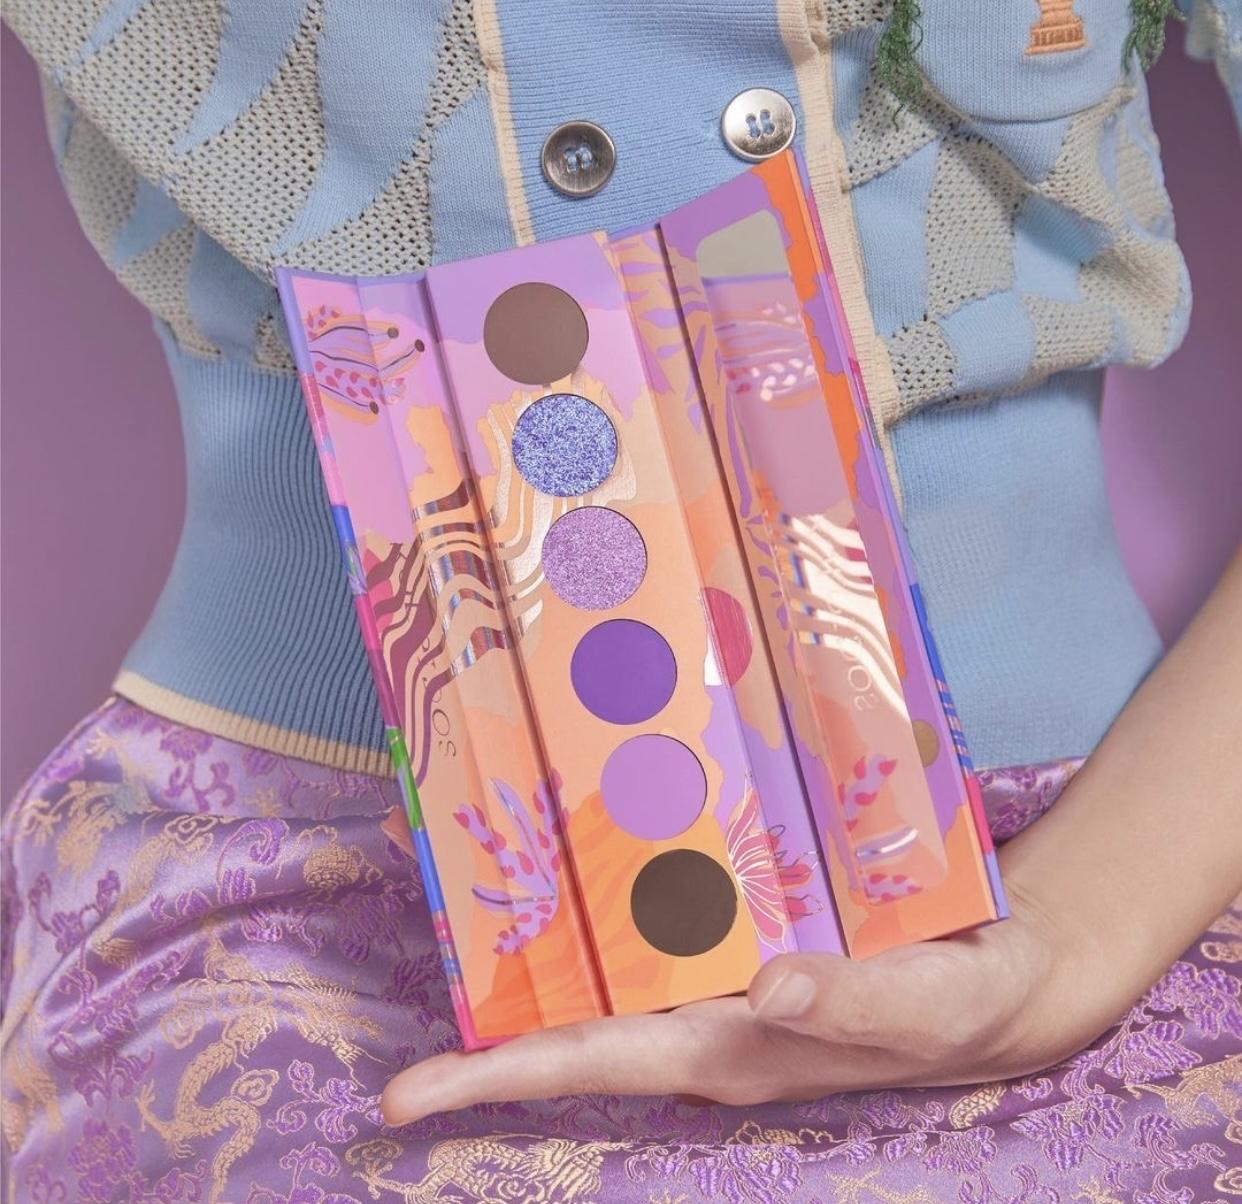 Kaleidos MakeUp Futurism VI: Lunar Lavender